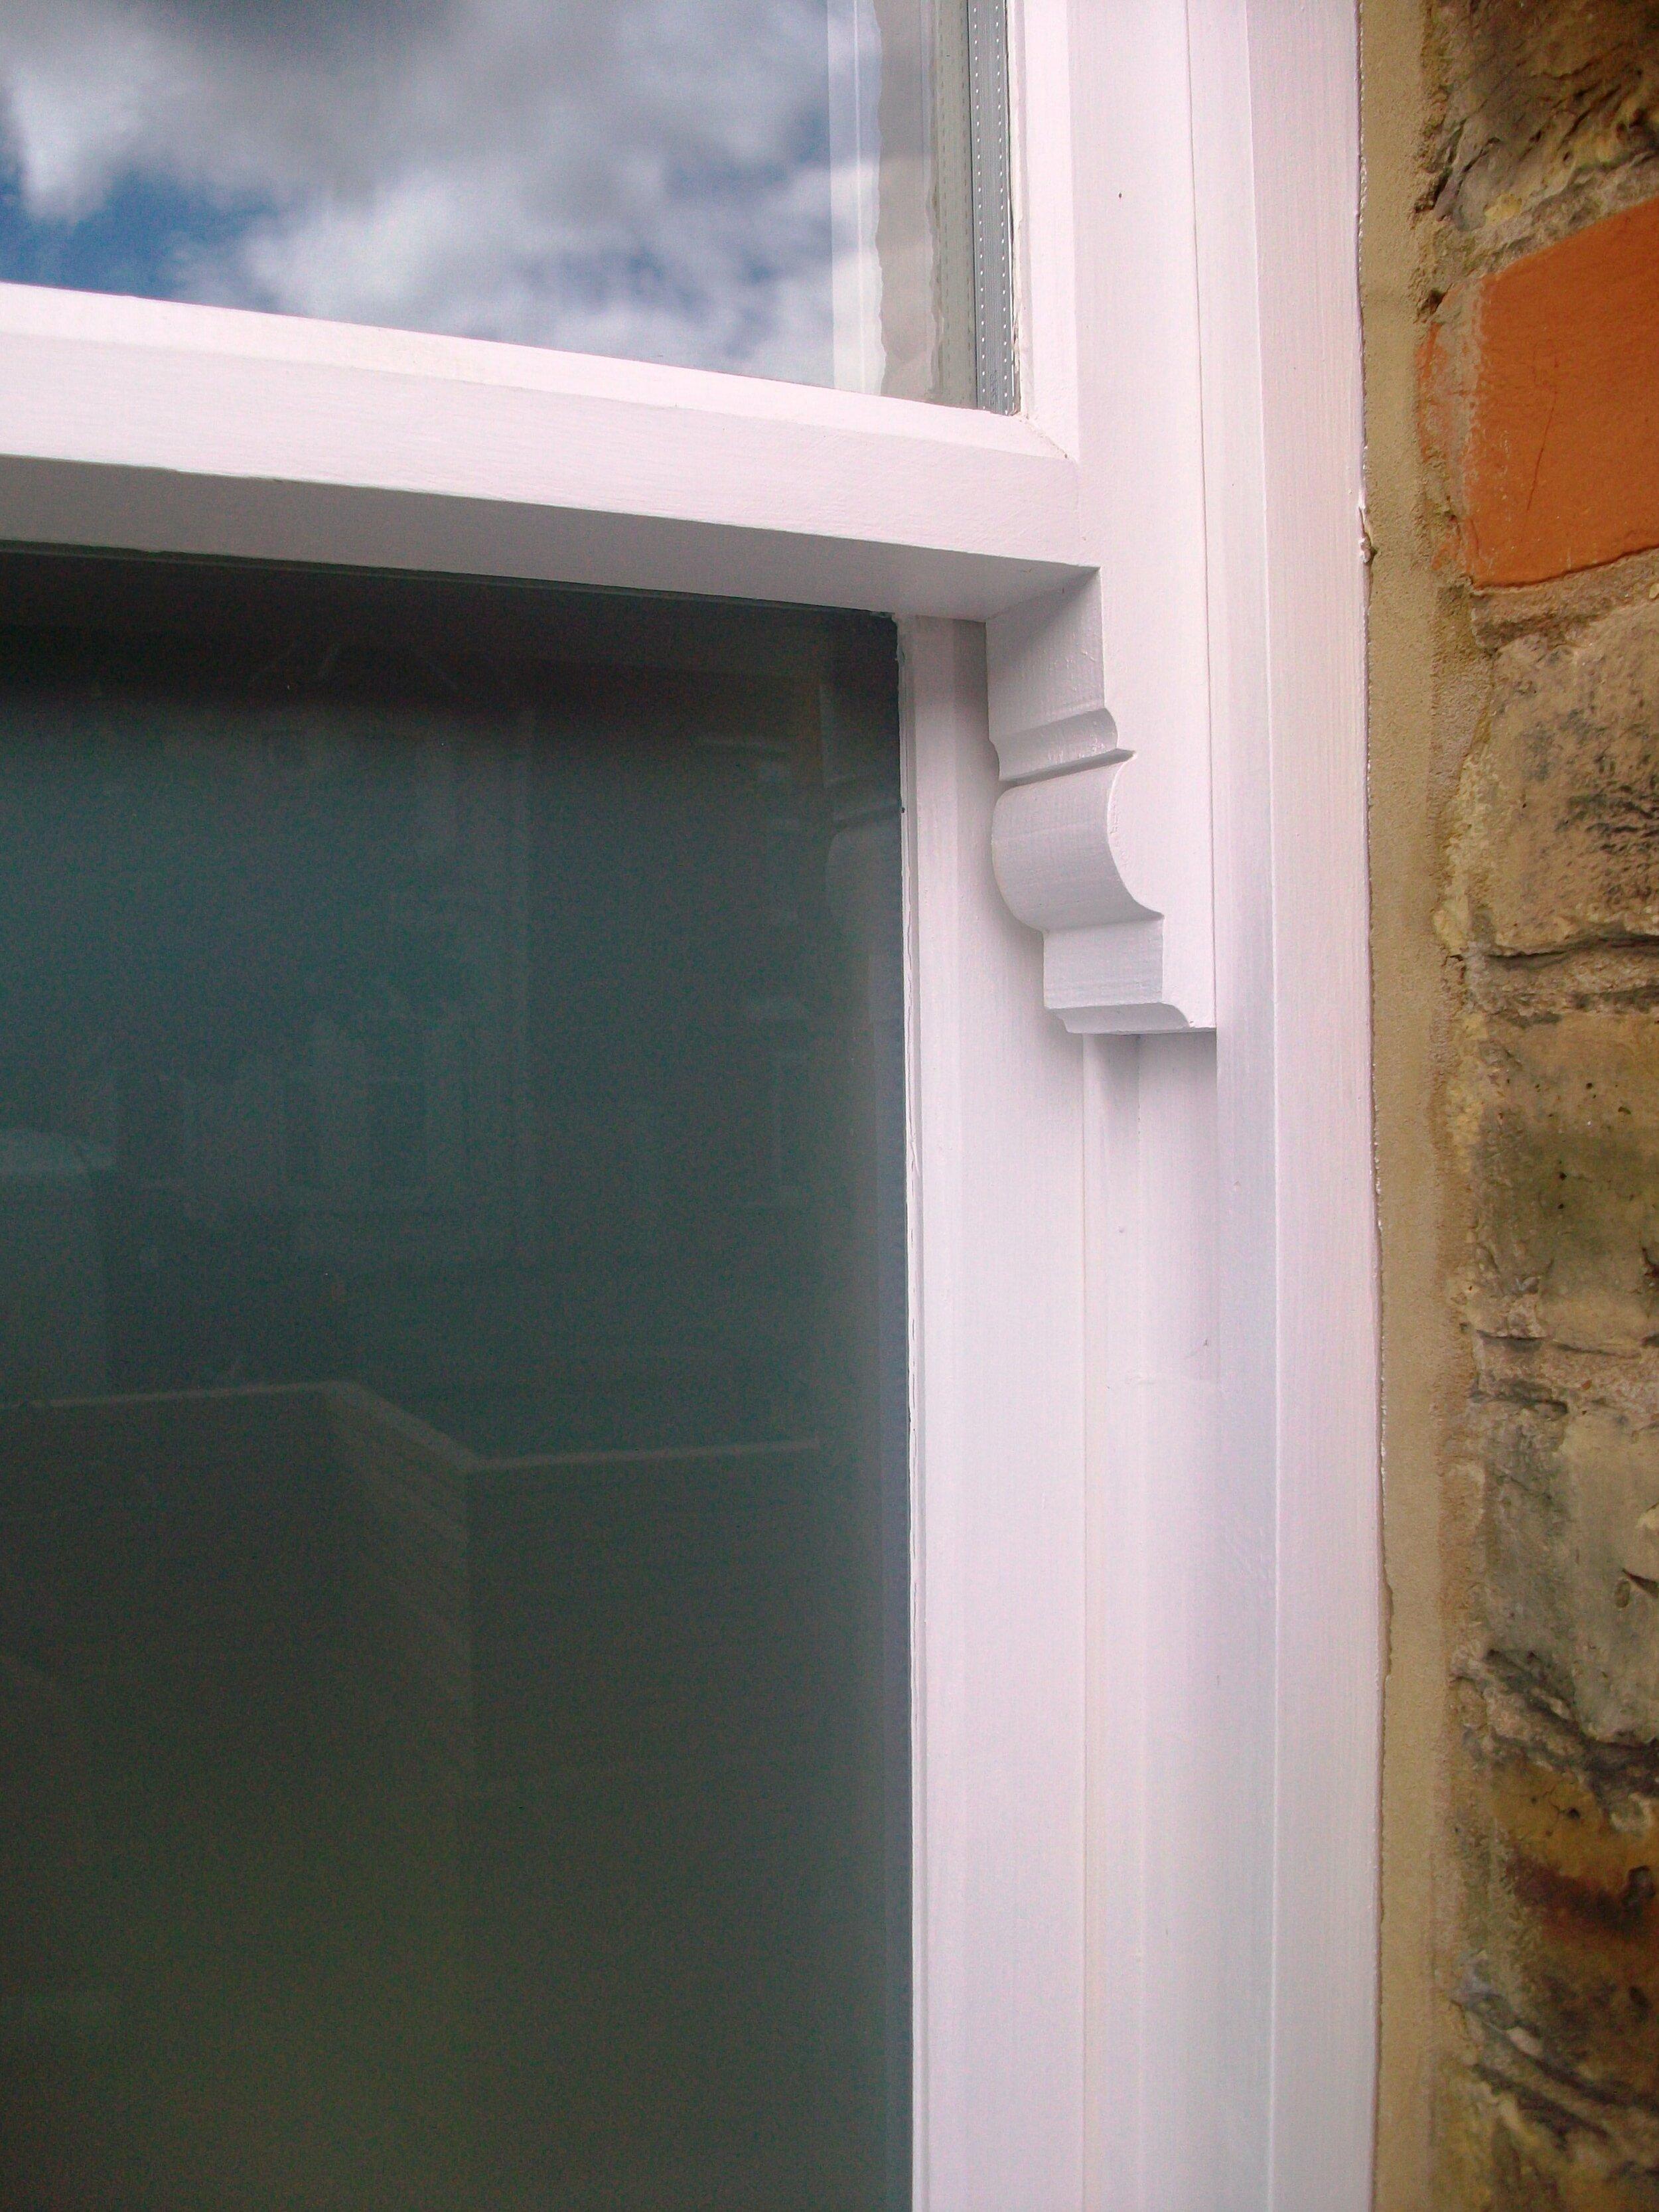 aeg-windows-01b.JPG